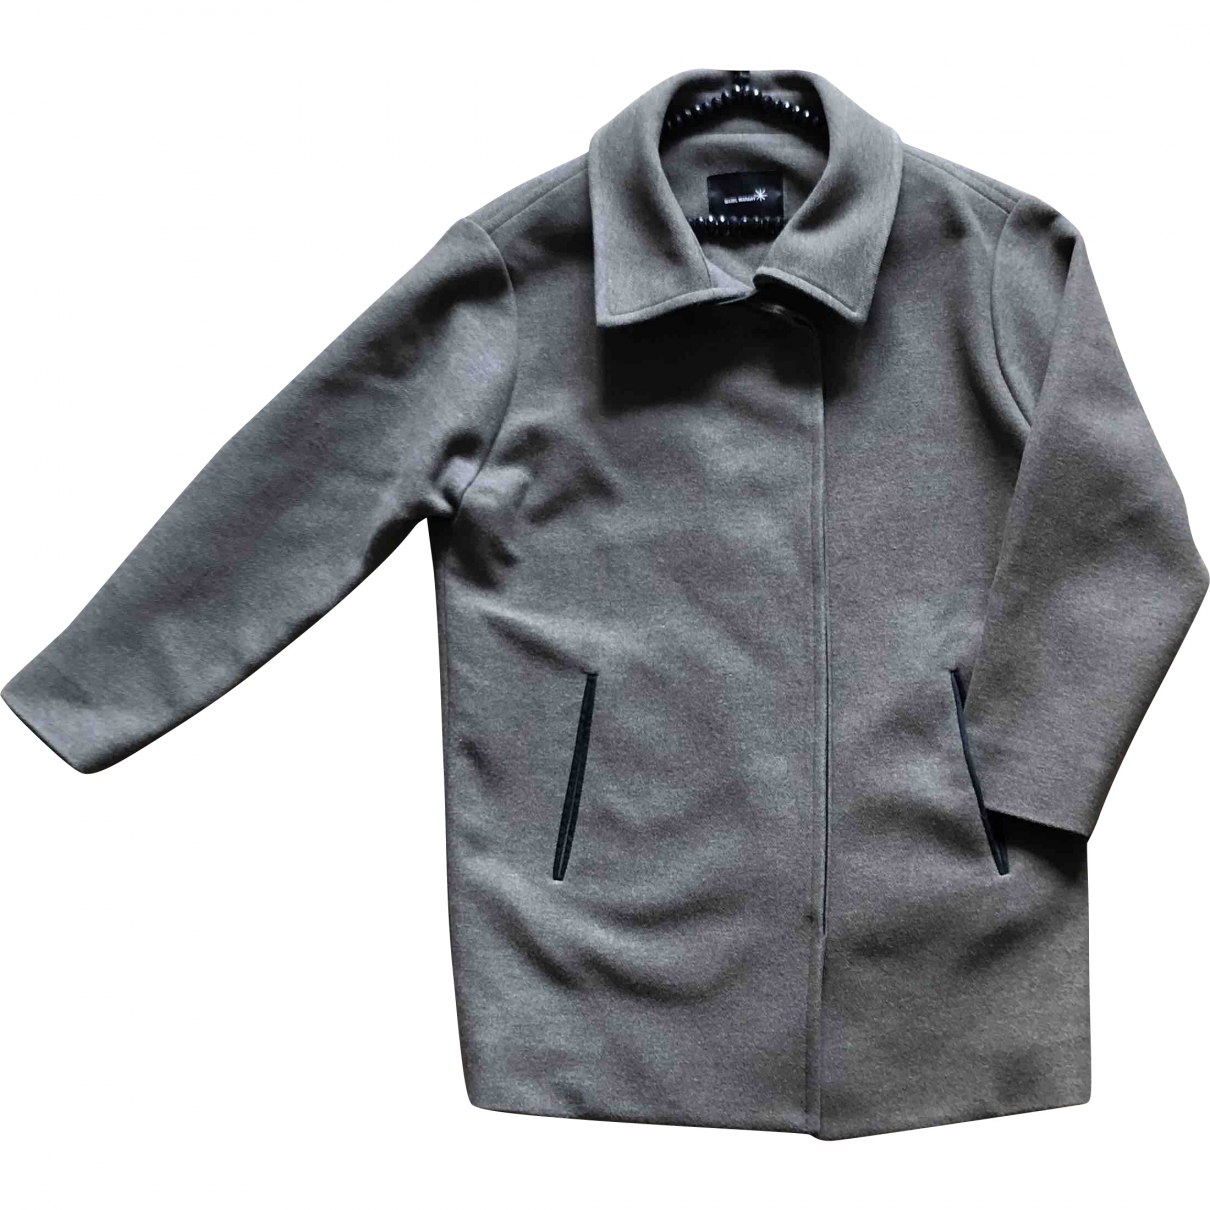 Isabel Marant \N Khaki Wool coat for Women 36 FR